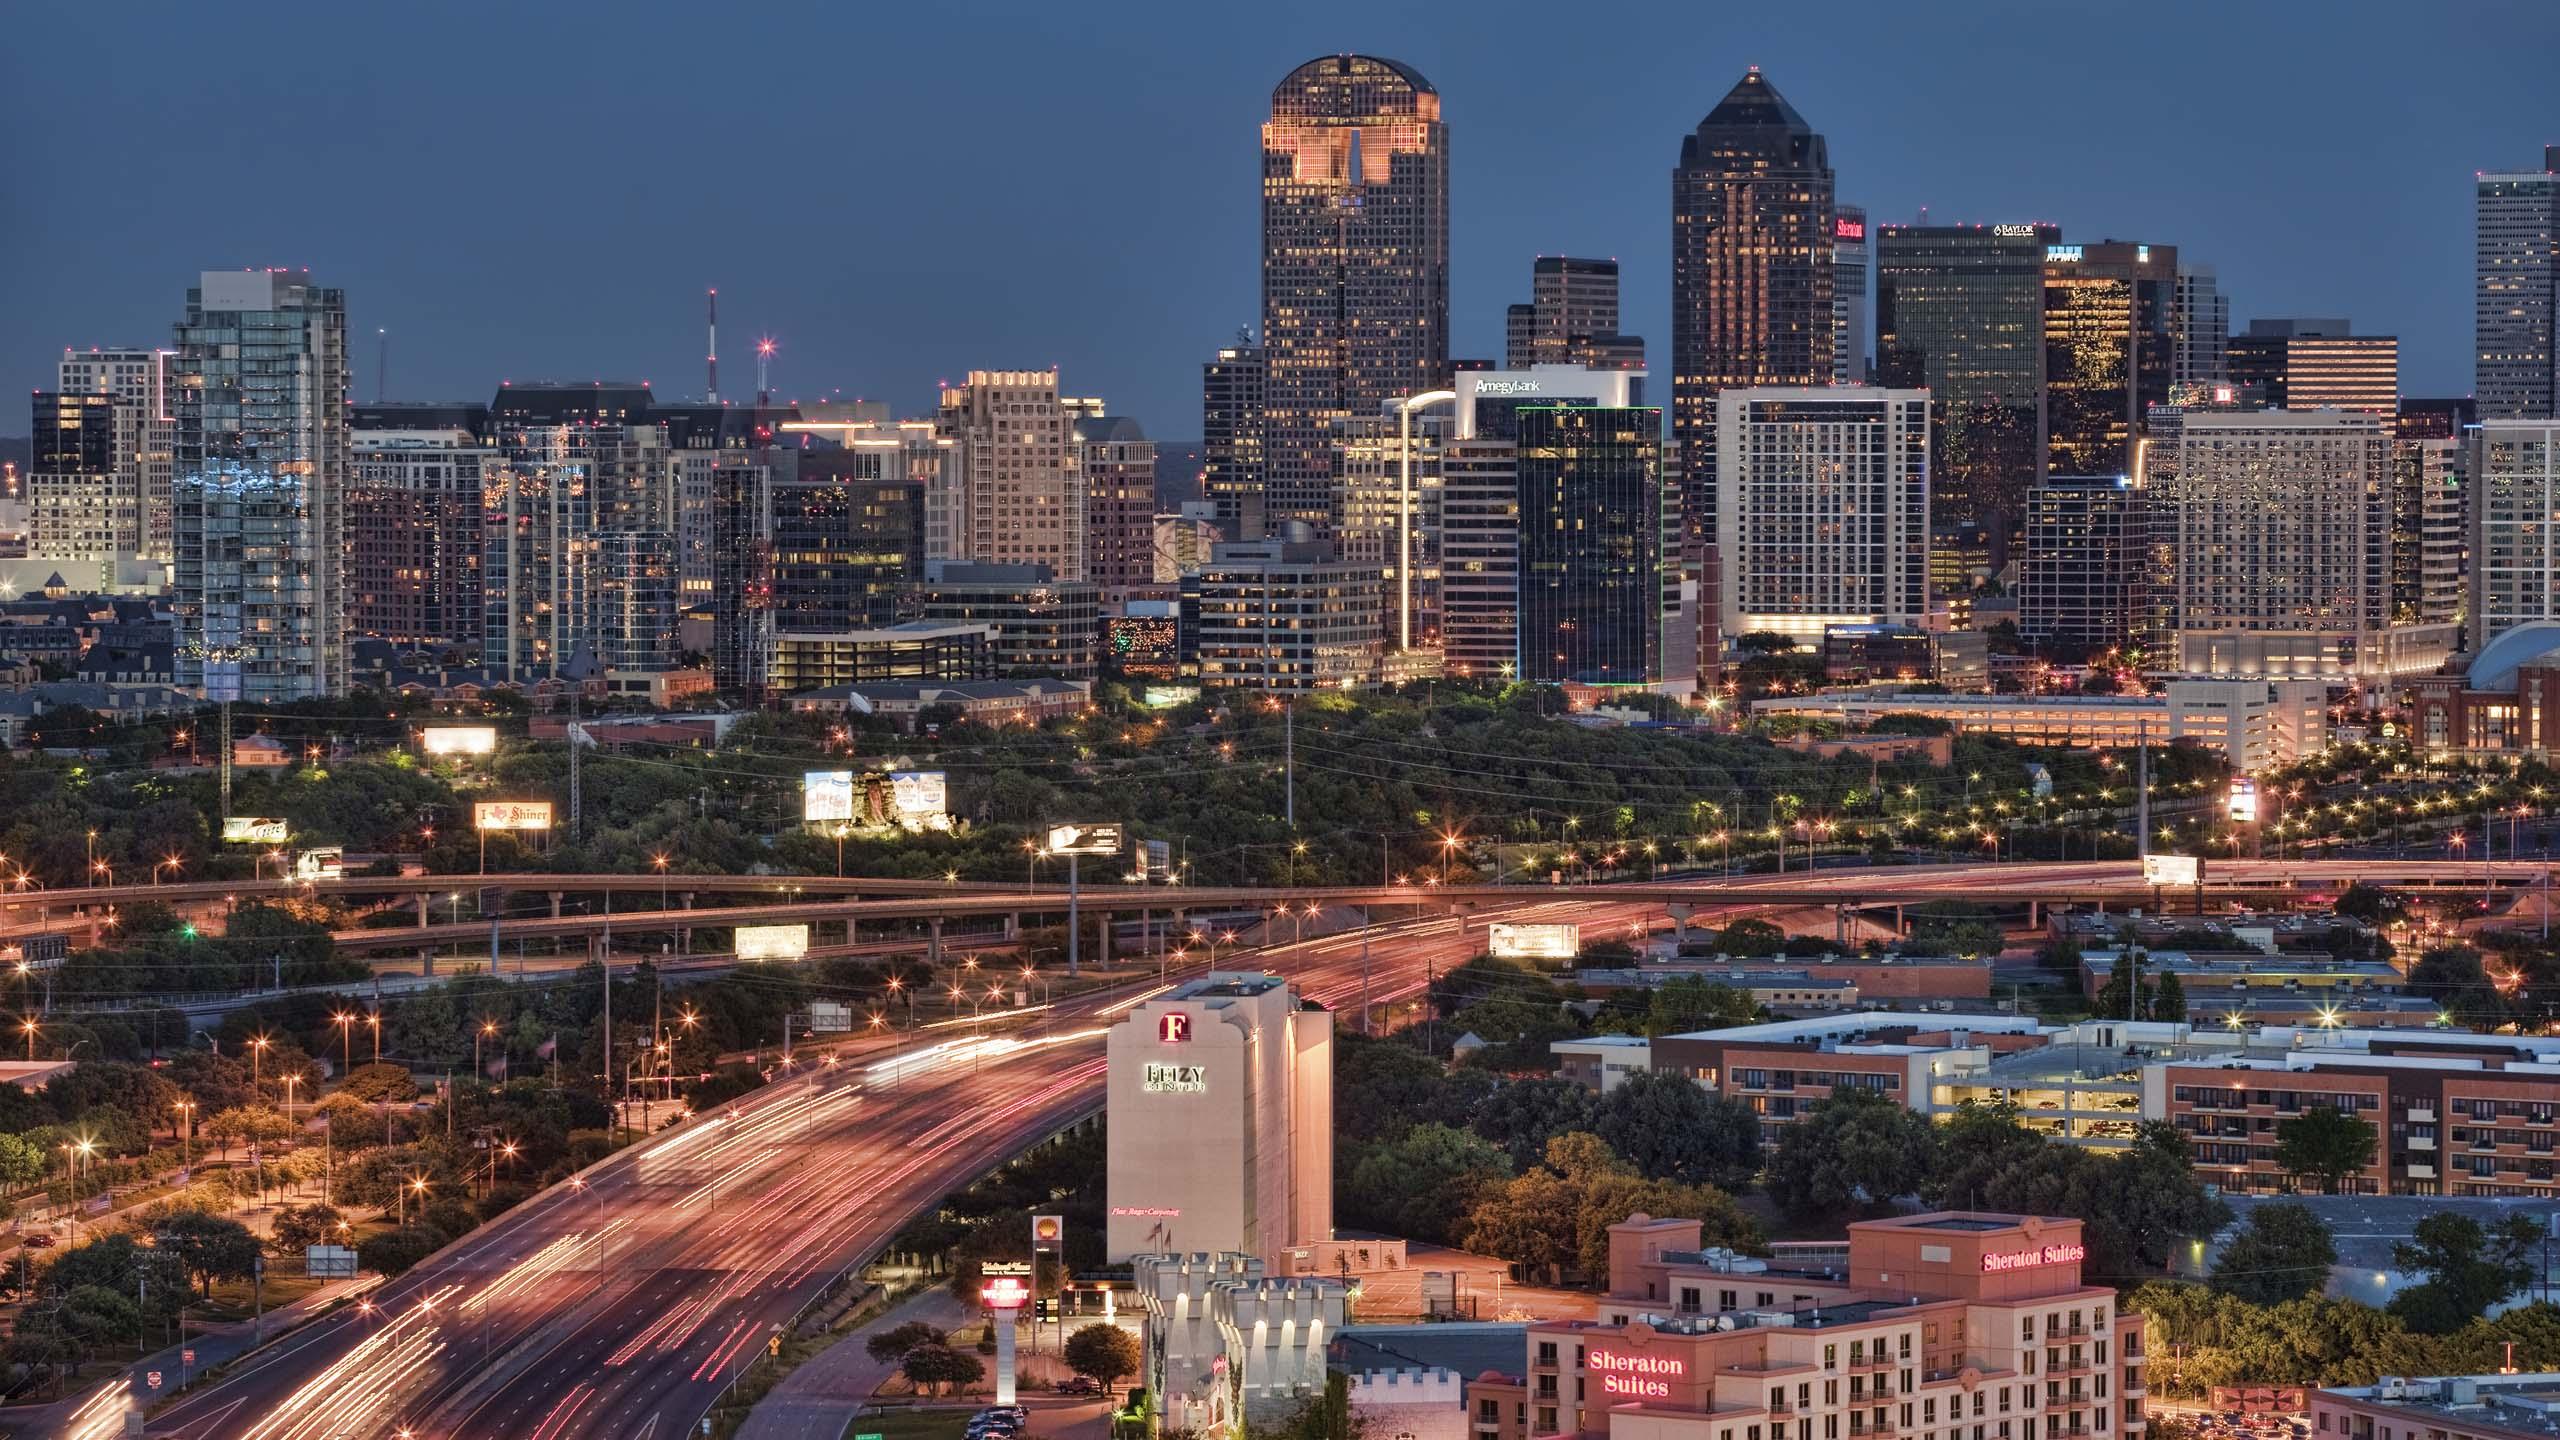 The Wonderful Dallas Skyline A or B James Brandon